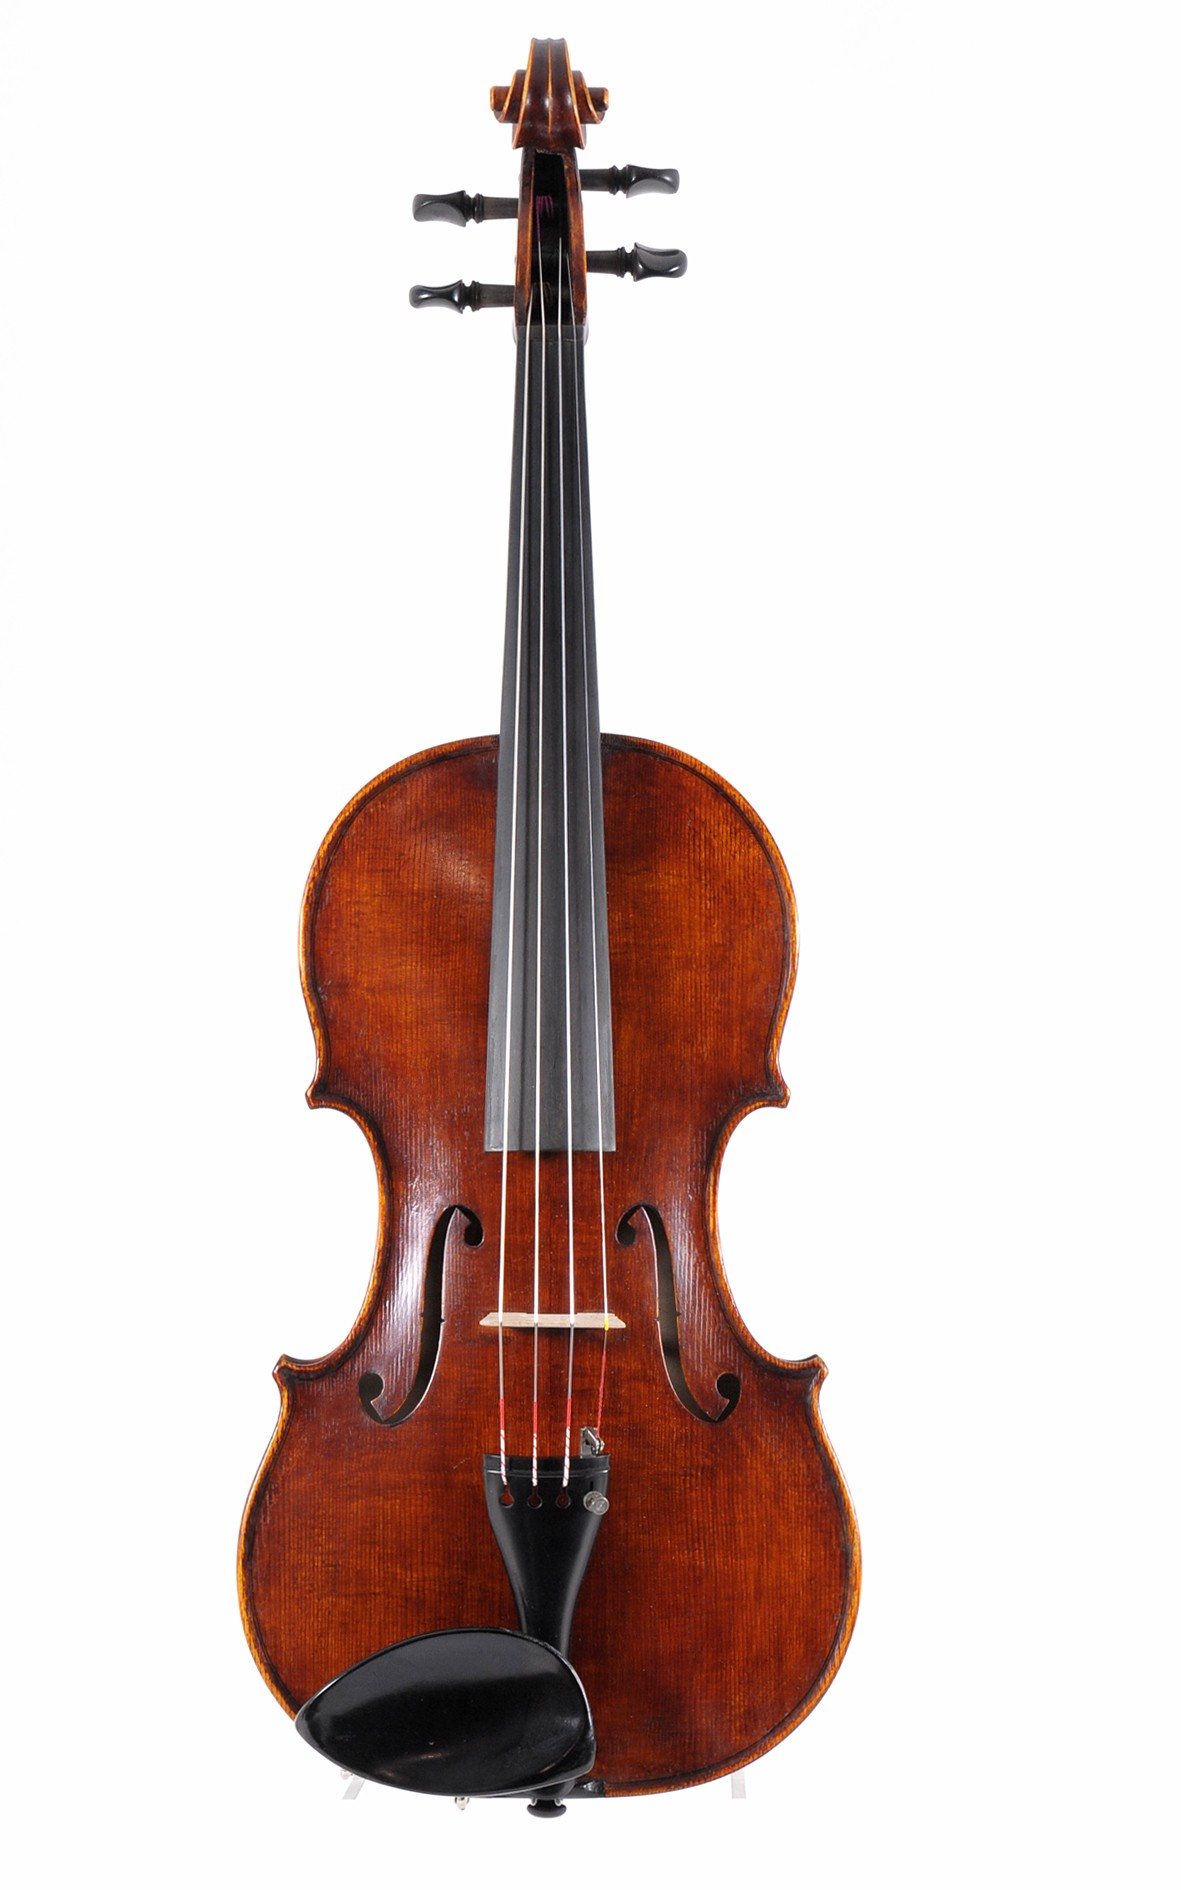 Violin by Kunstgeigenbau Reidelbach